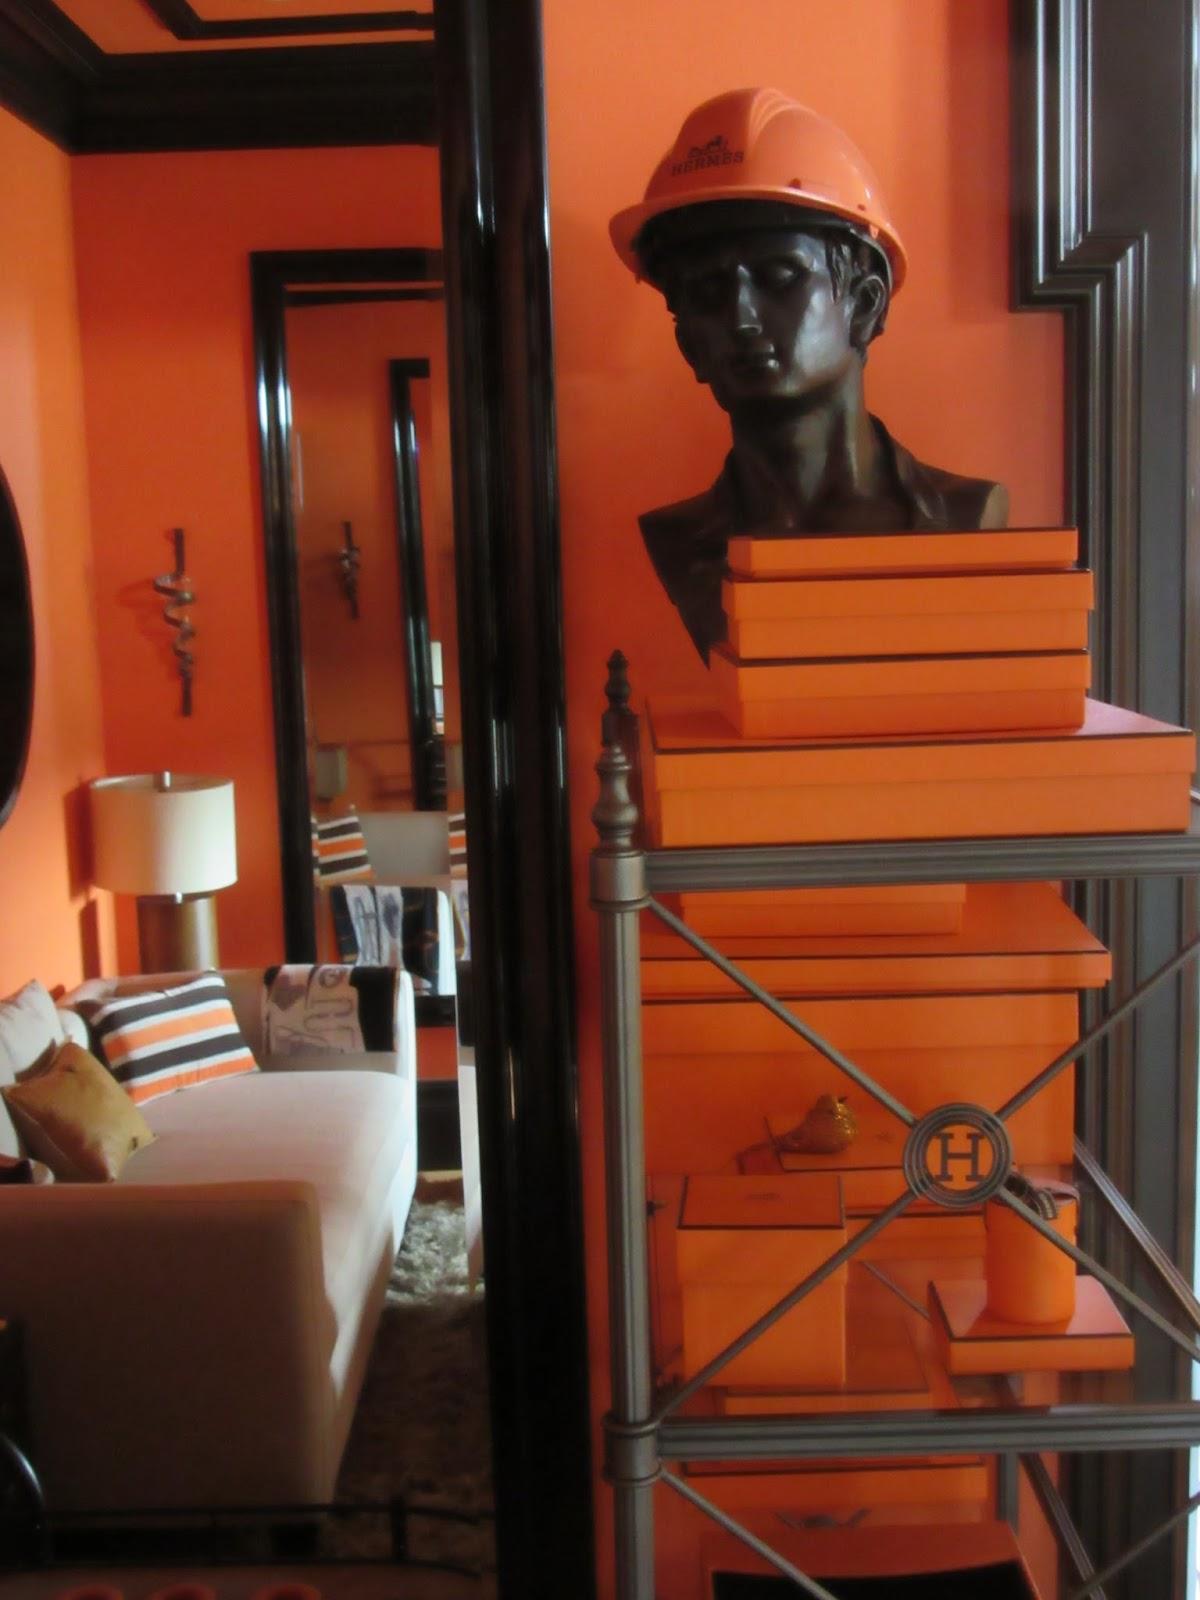 orangeroom 5 - 1.jpg